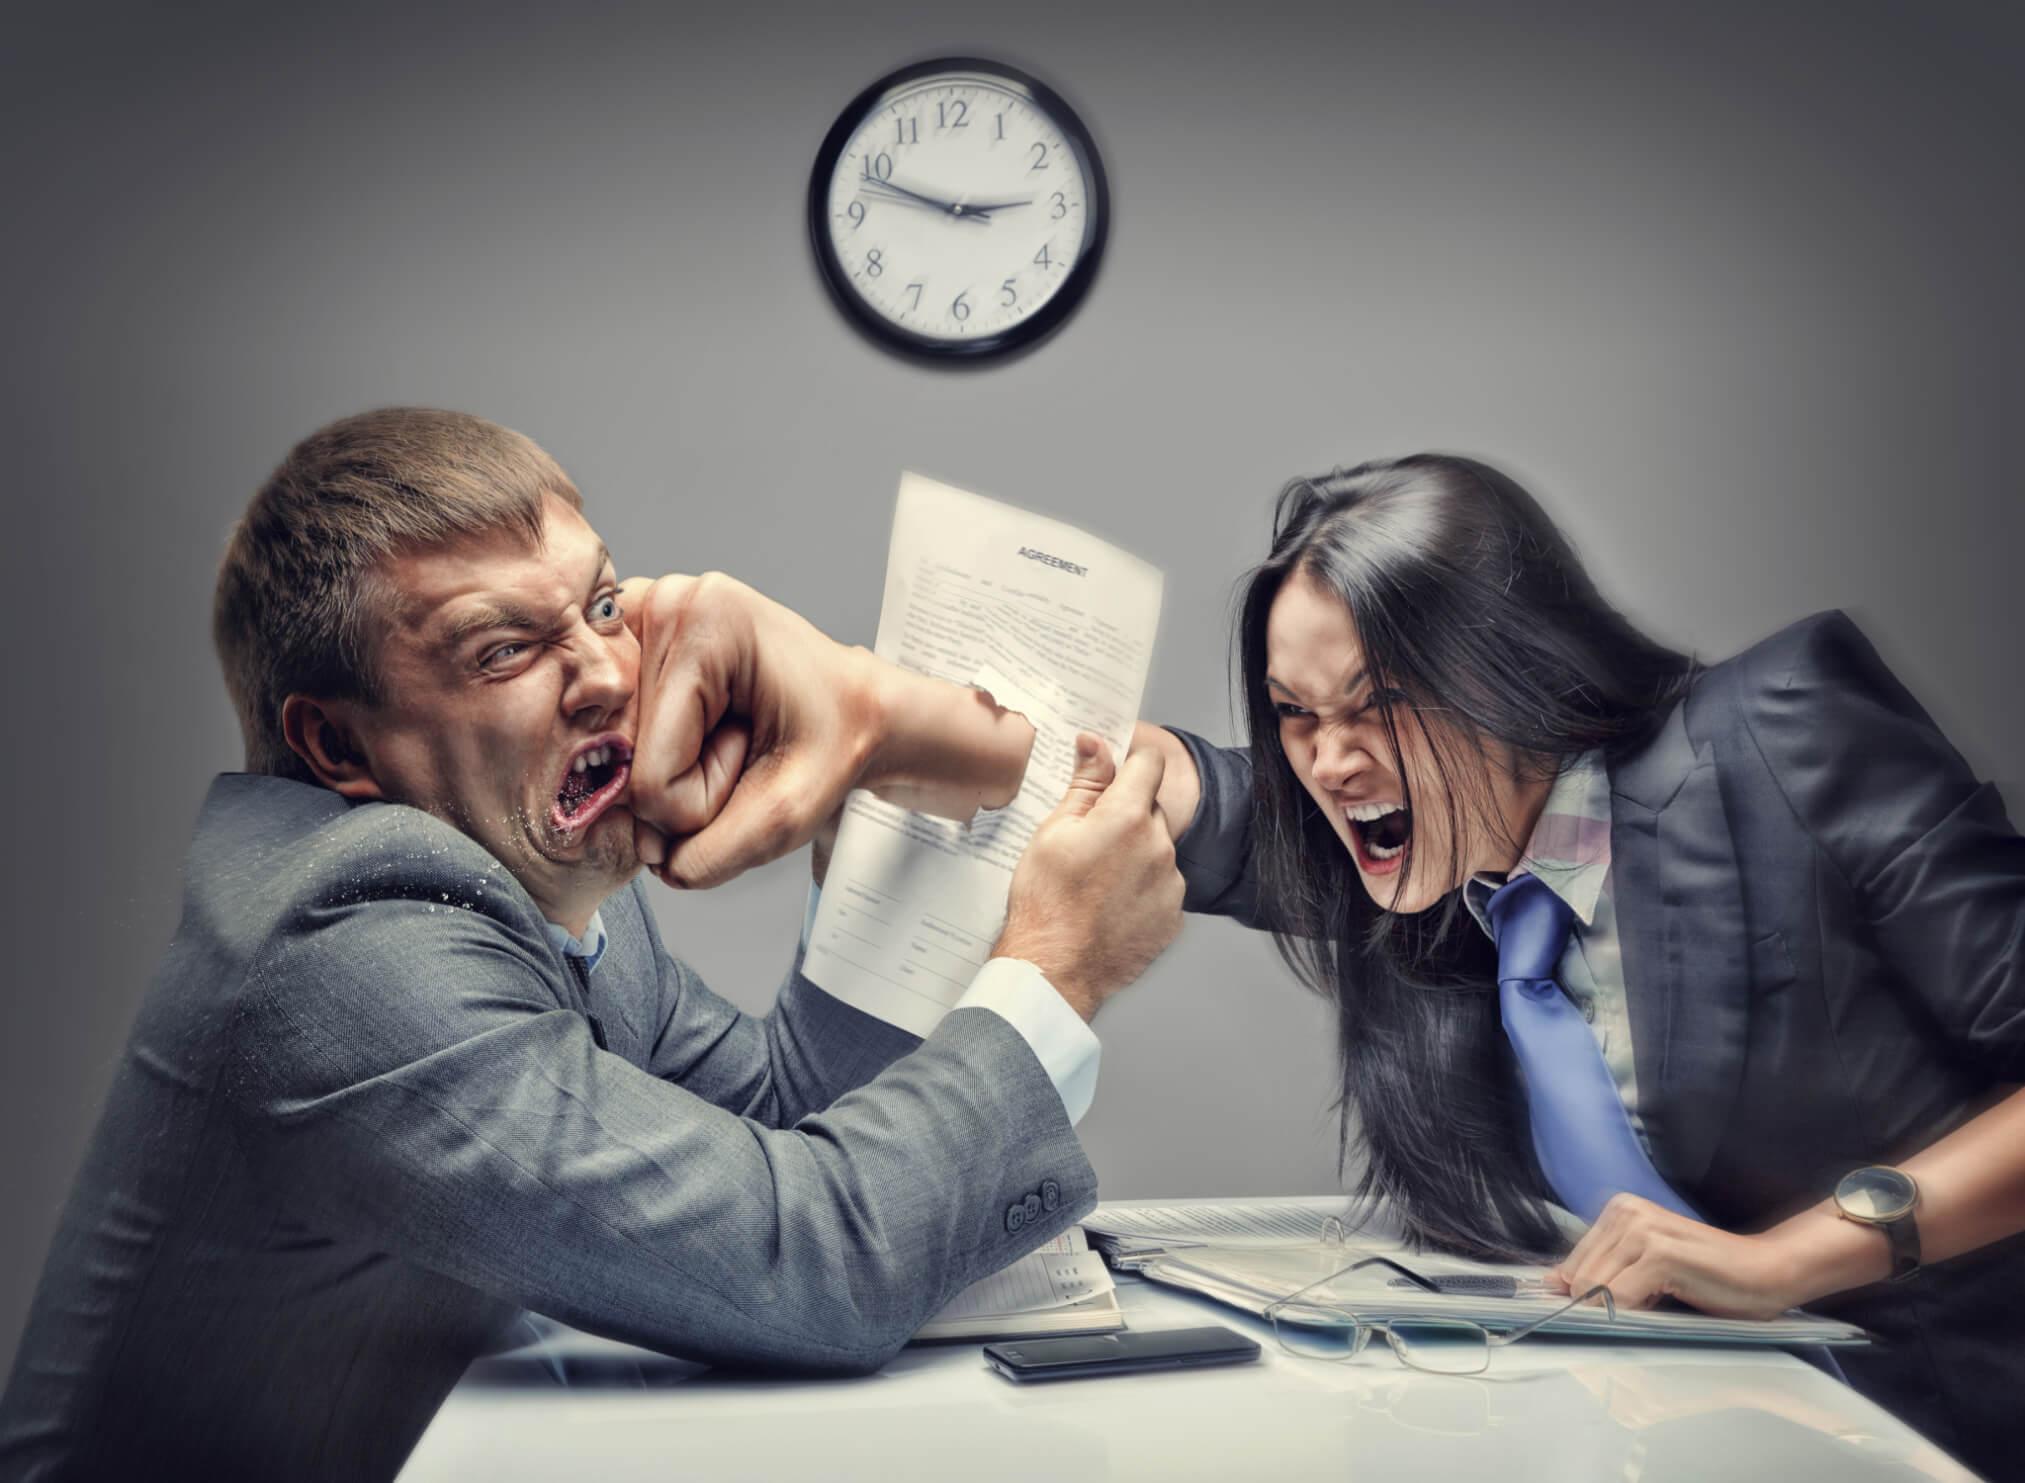 Perceraian, Benarkah Itu Bentuk Kegagalan Rumah Tangga?